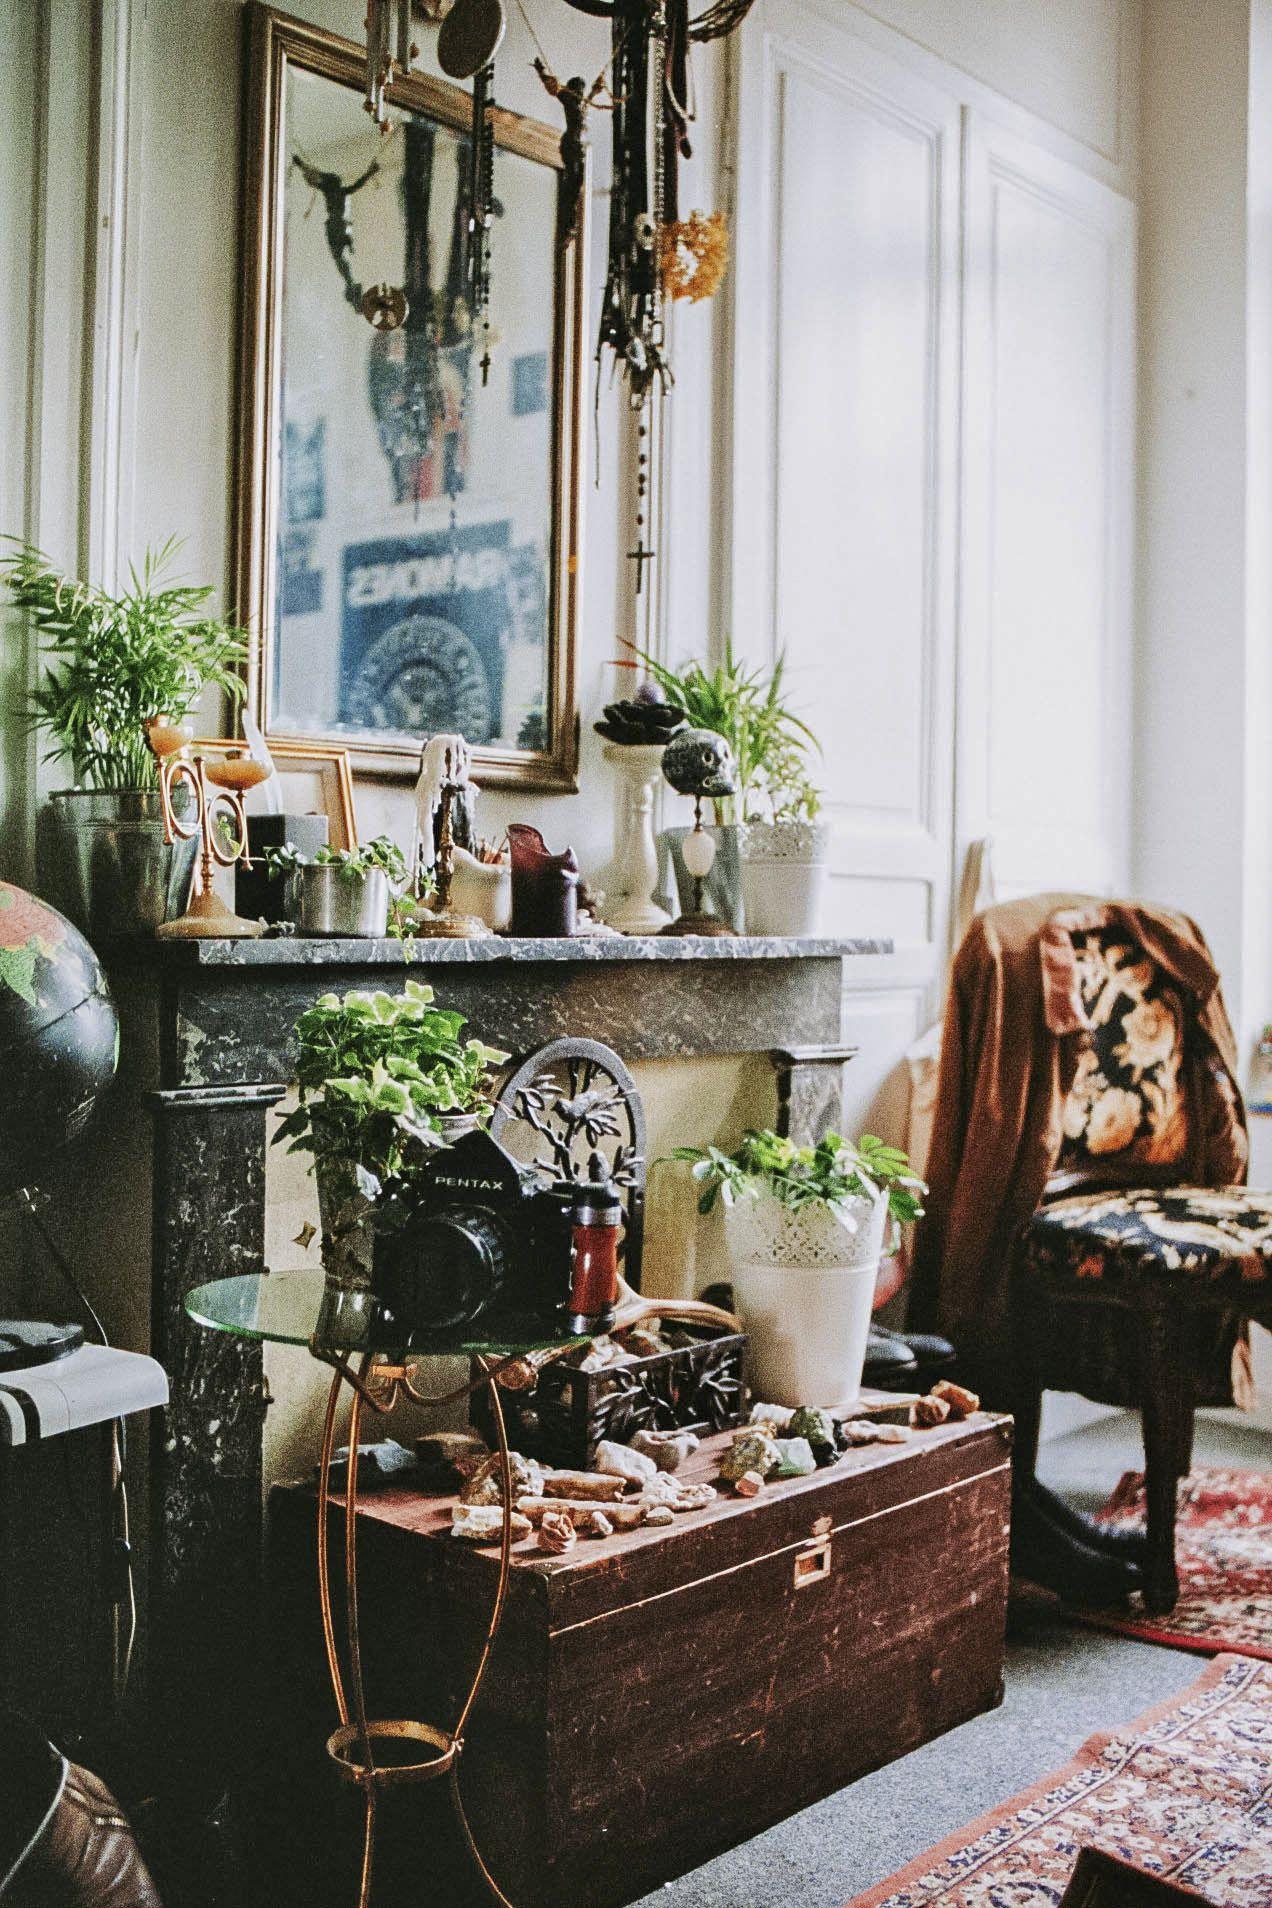 theogosselin | boho mojo | Pinterest | Maison, Décoration maison and ...